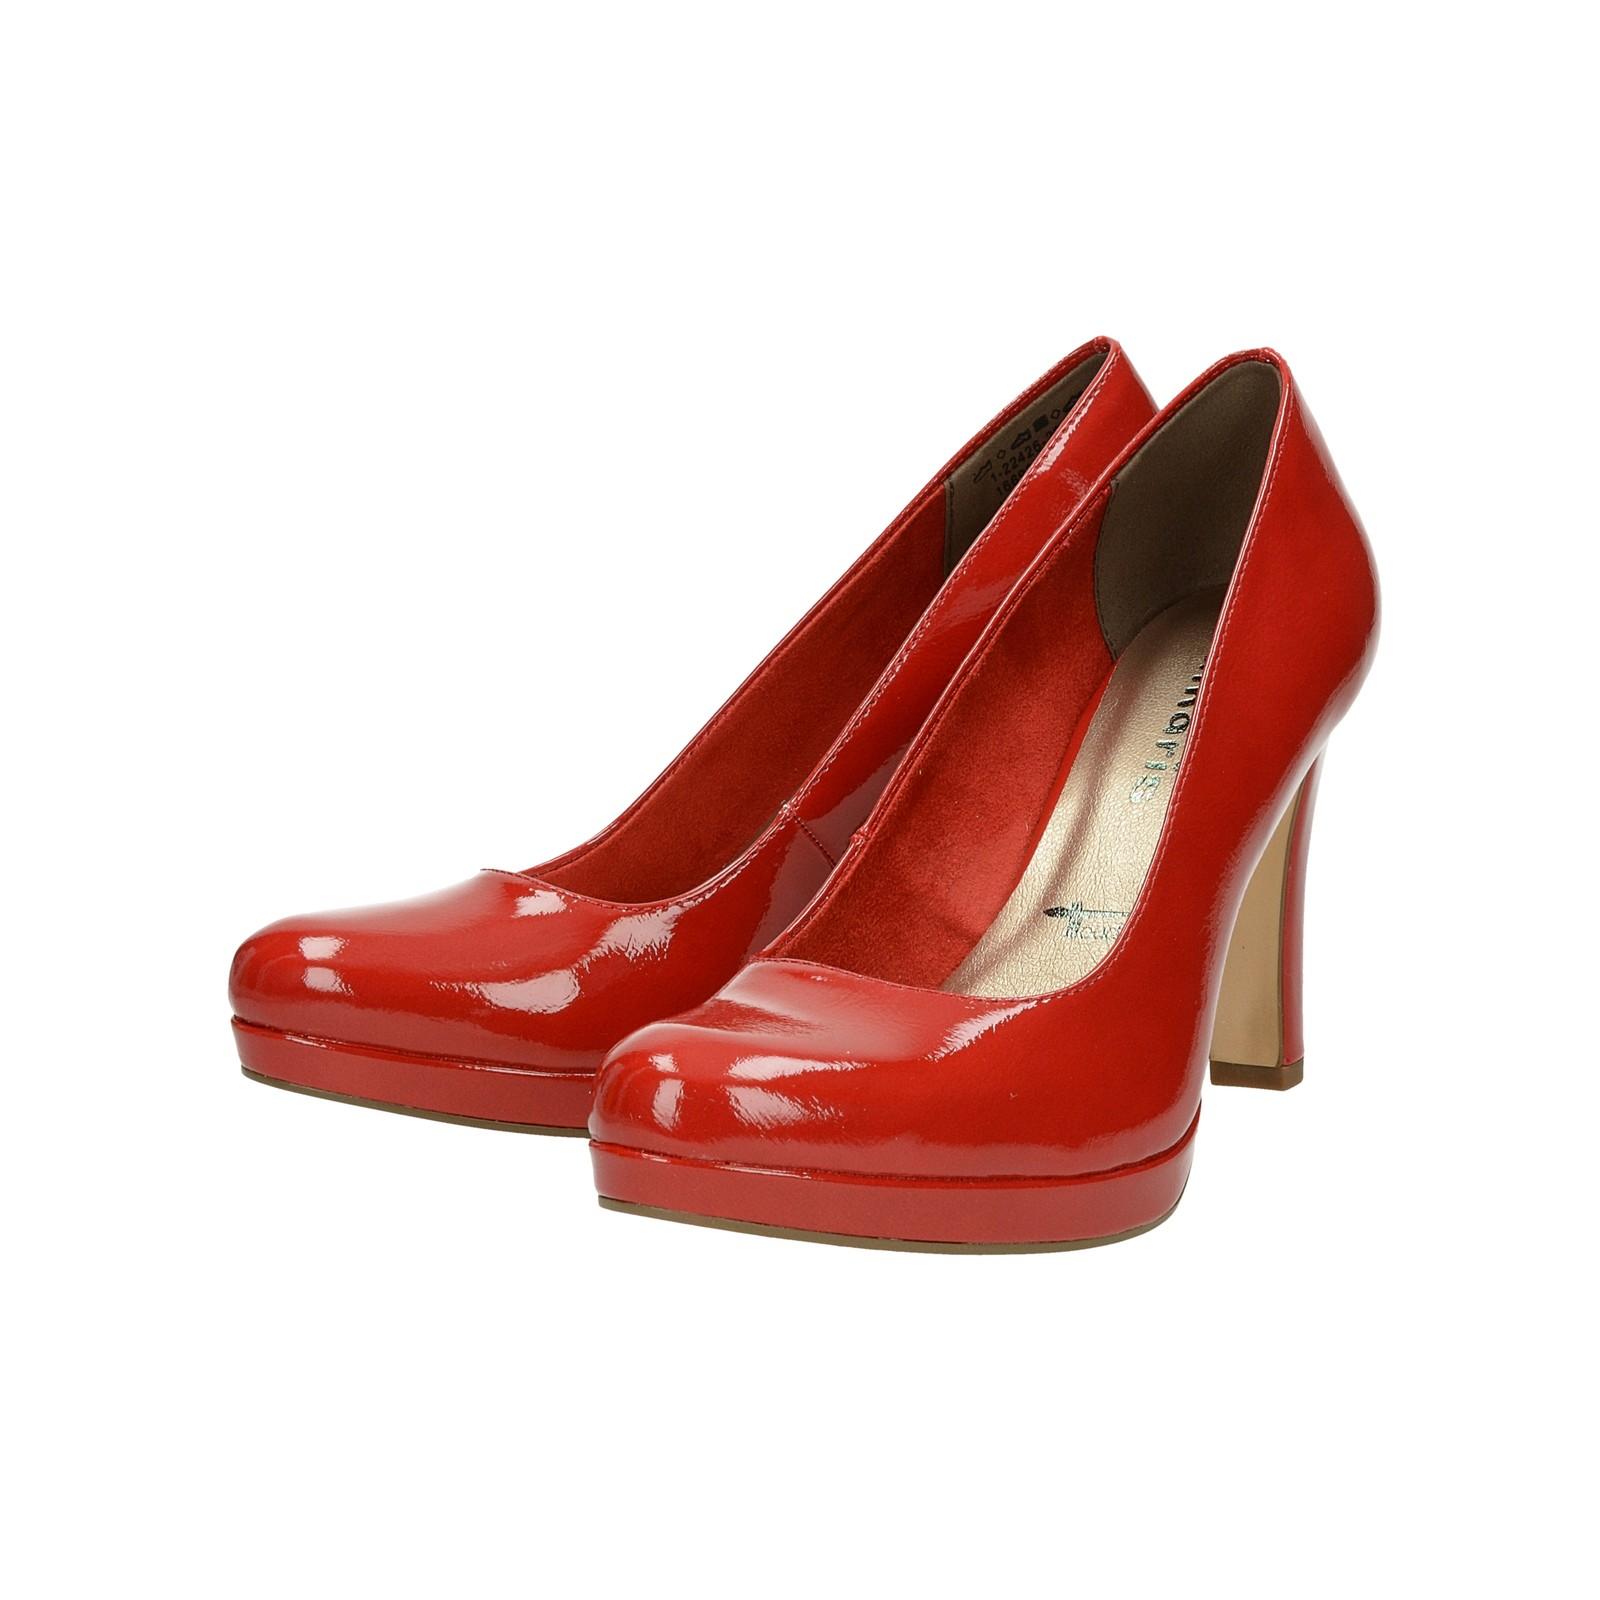 cc9f2531d1 ... Tamaris dámske lakované lodičky - červené ...